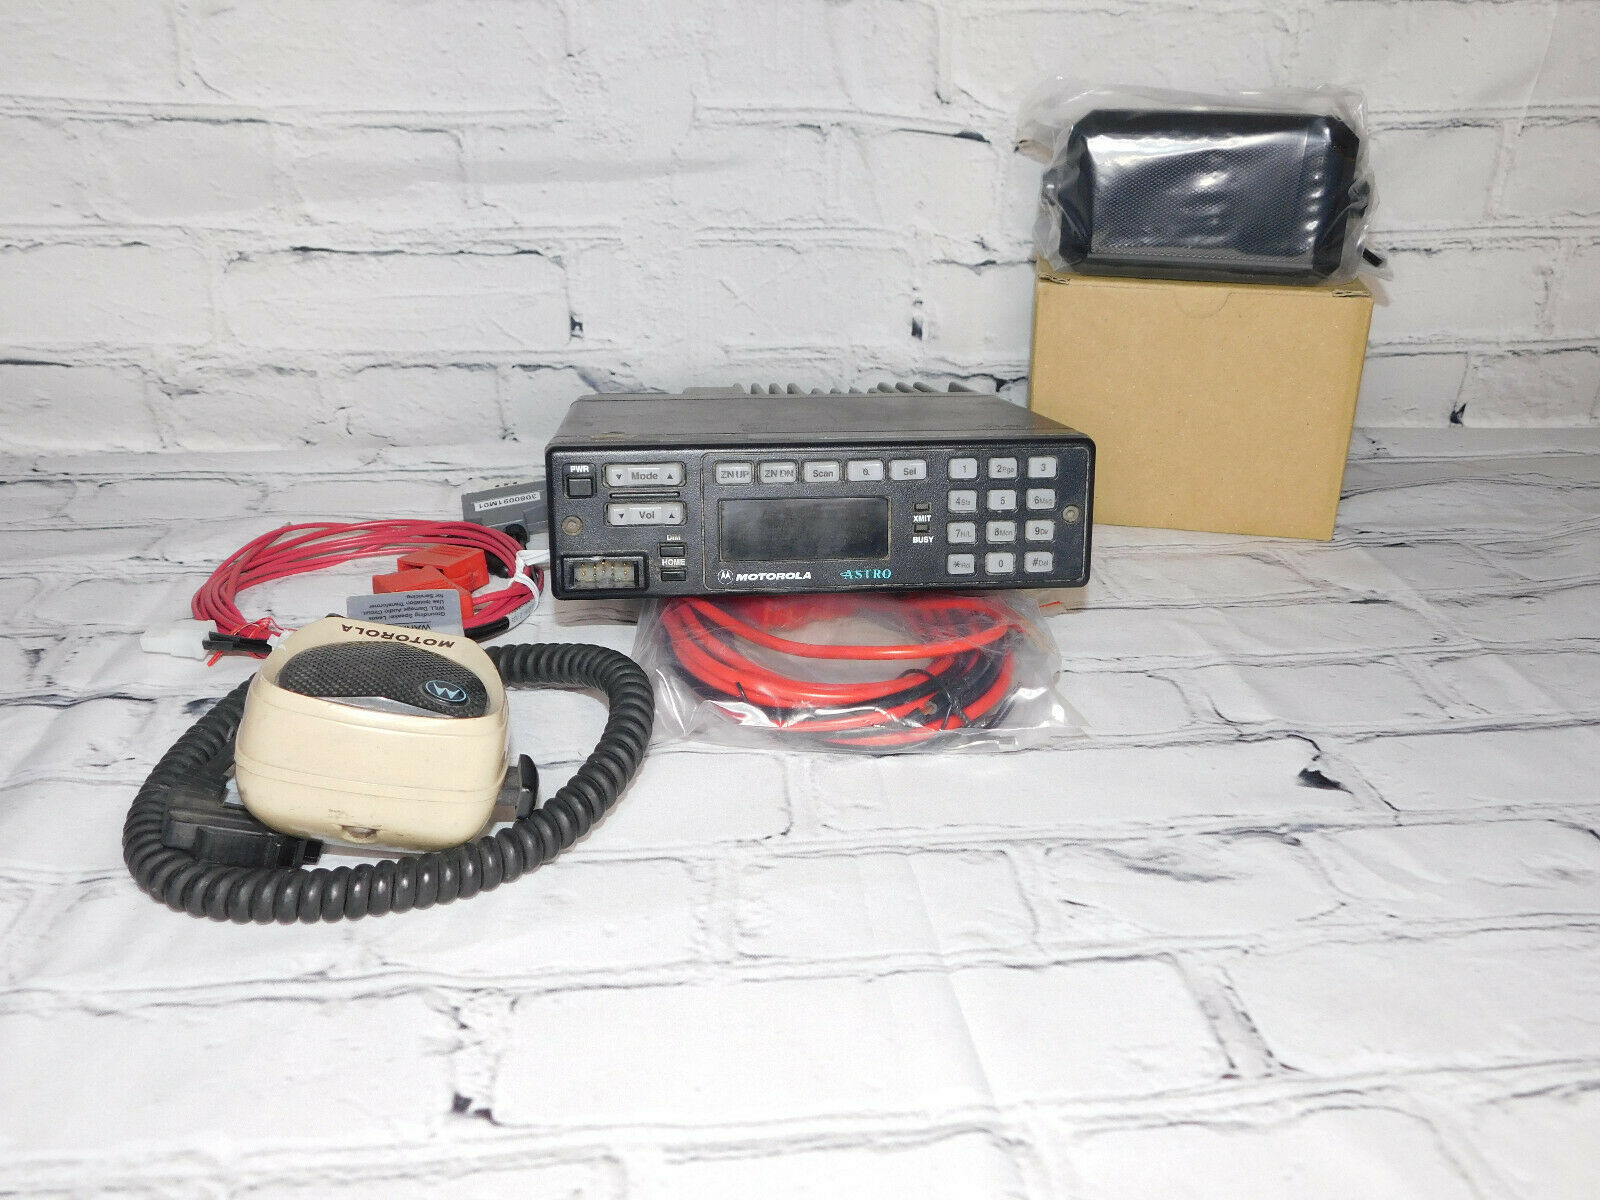 Motorola VHF Astro spectra W7 P25 Digital Mobile radio W/ AES/DES Encryption . Buy it now for 195.00